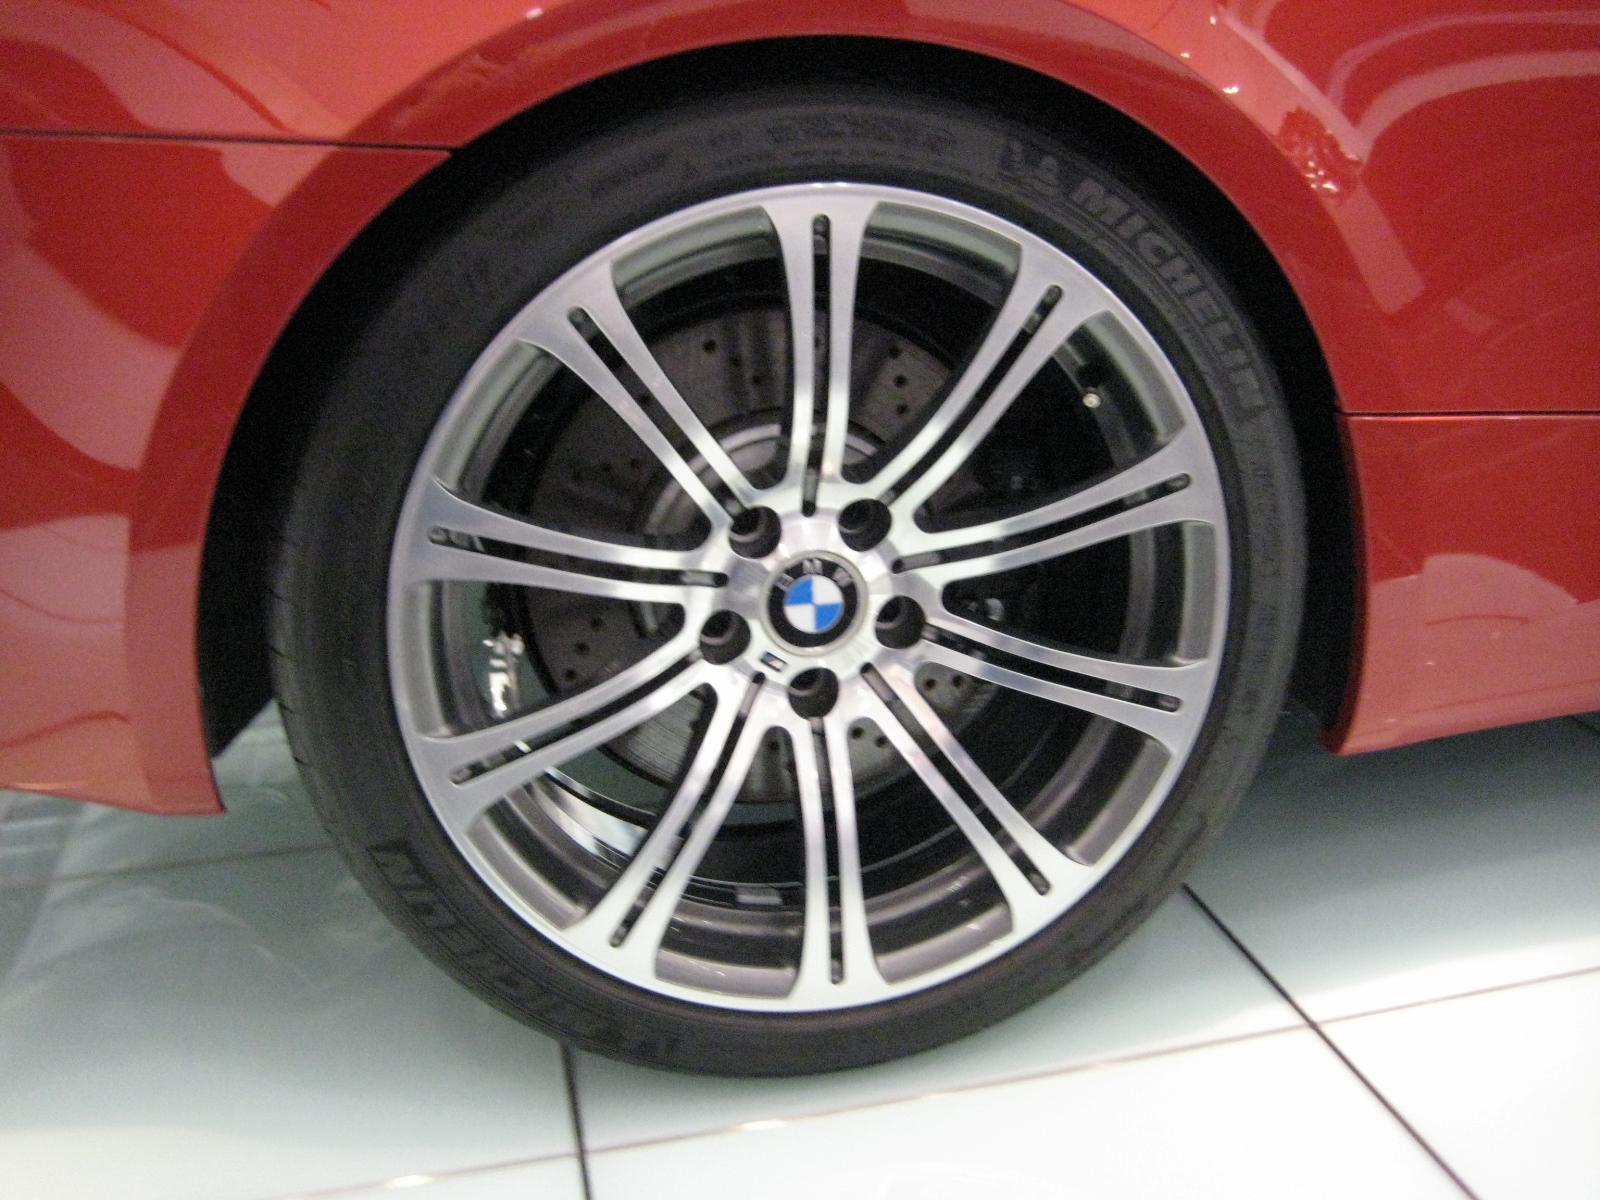 upload.wikimedia.org/wikipedia/commons/9/94/BMW_E92_M3_Coup%C3%A9_Wheel.JPG